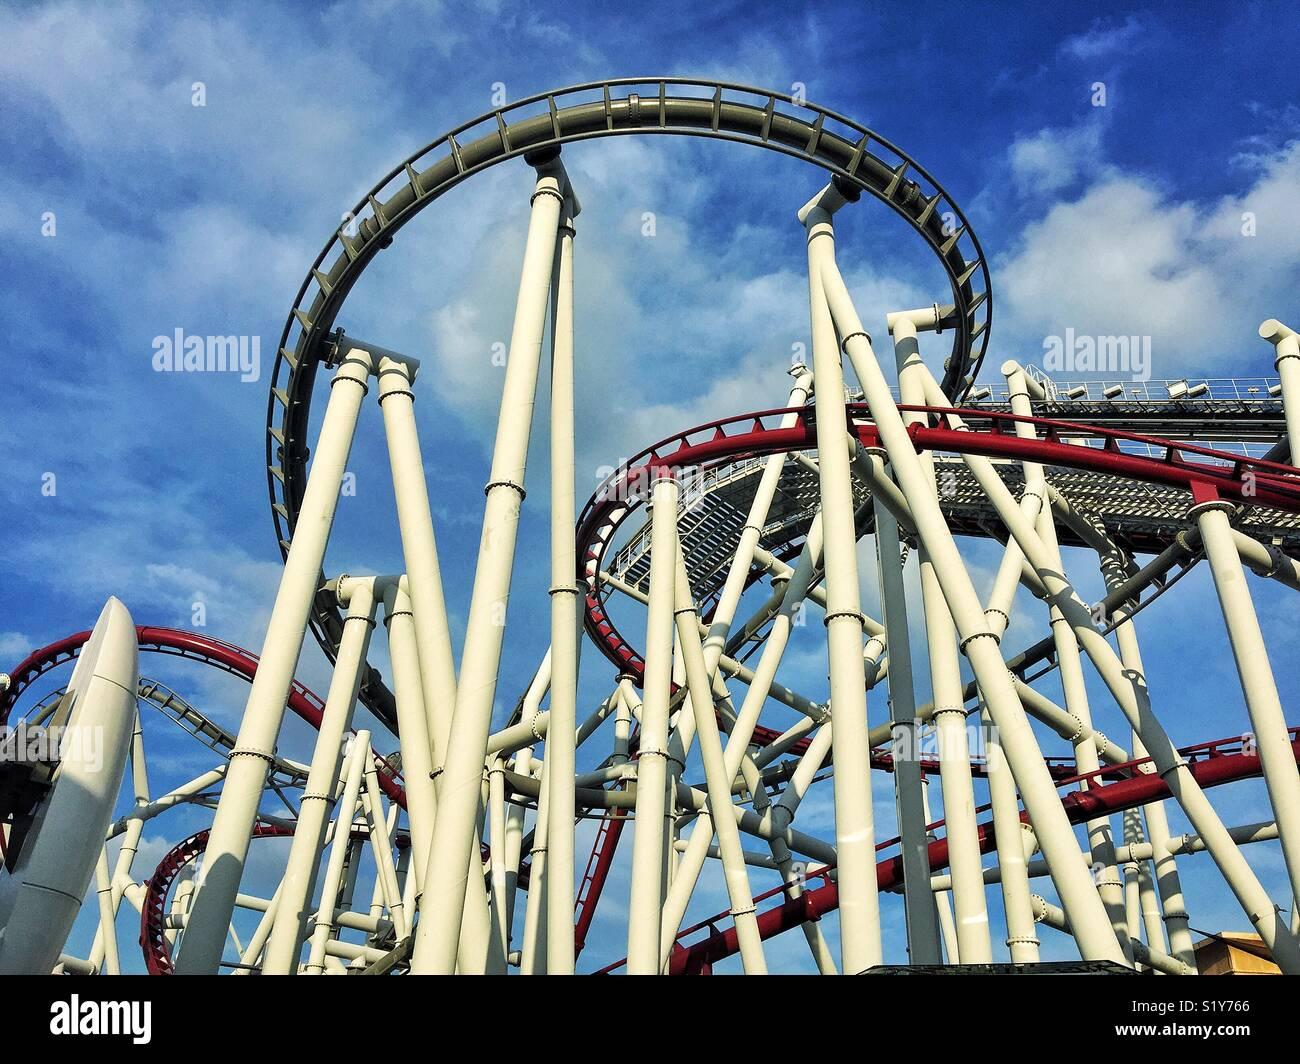 Thrill - Stock Image